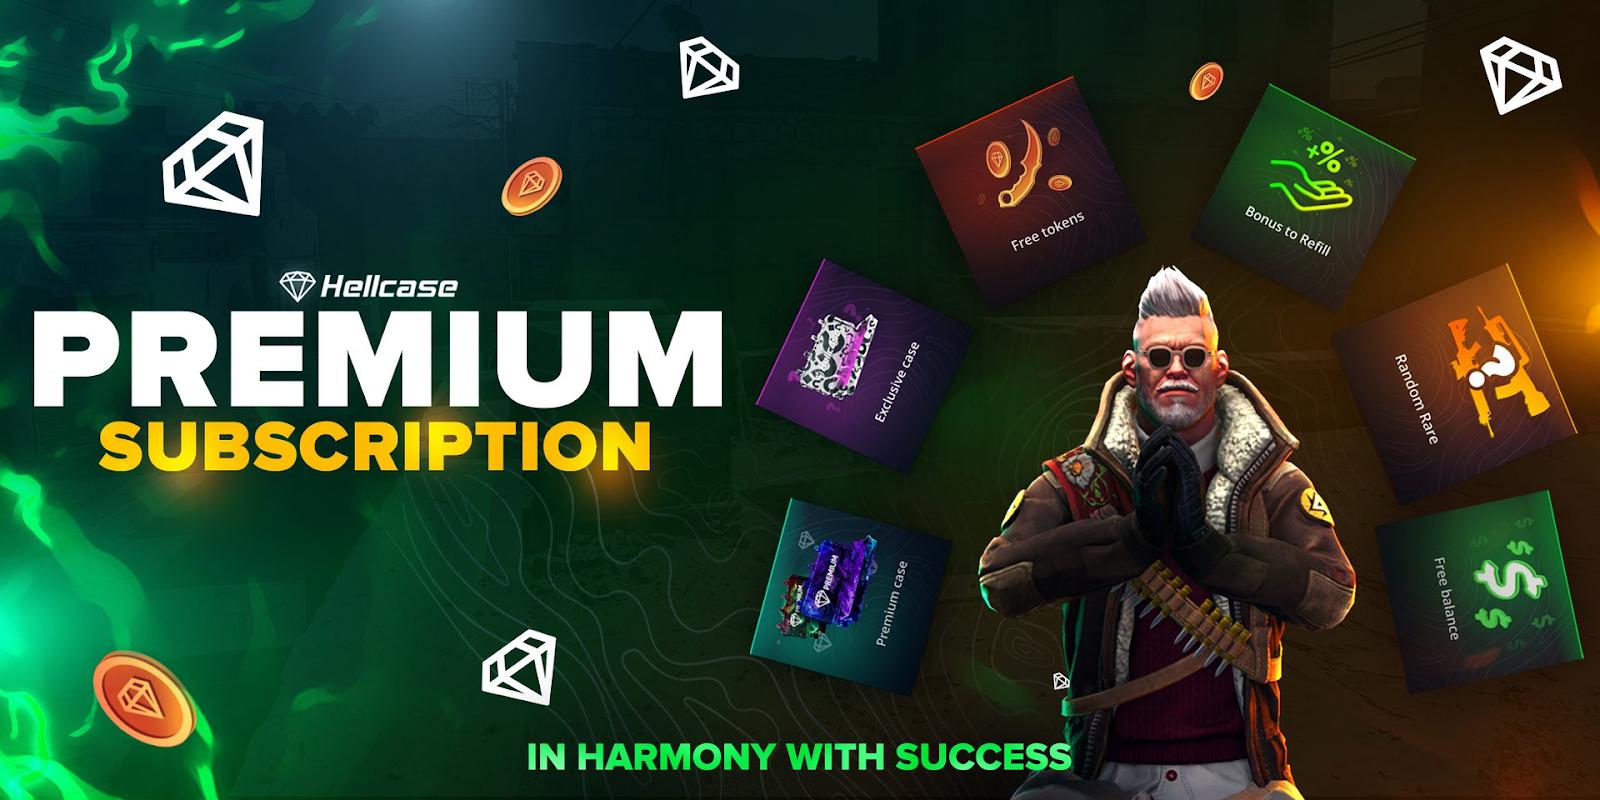 hellcase premium plans